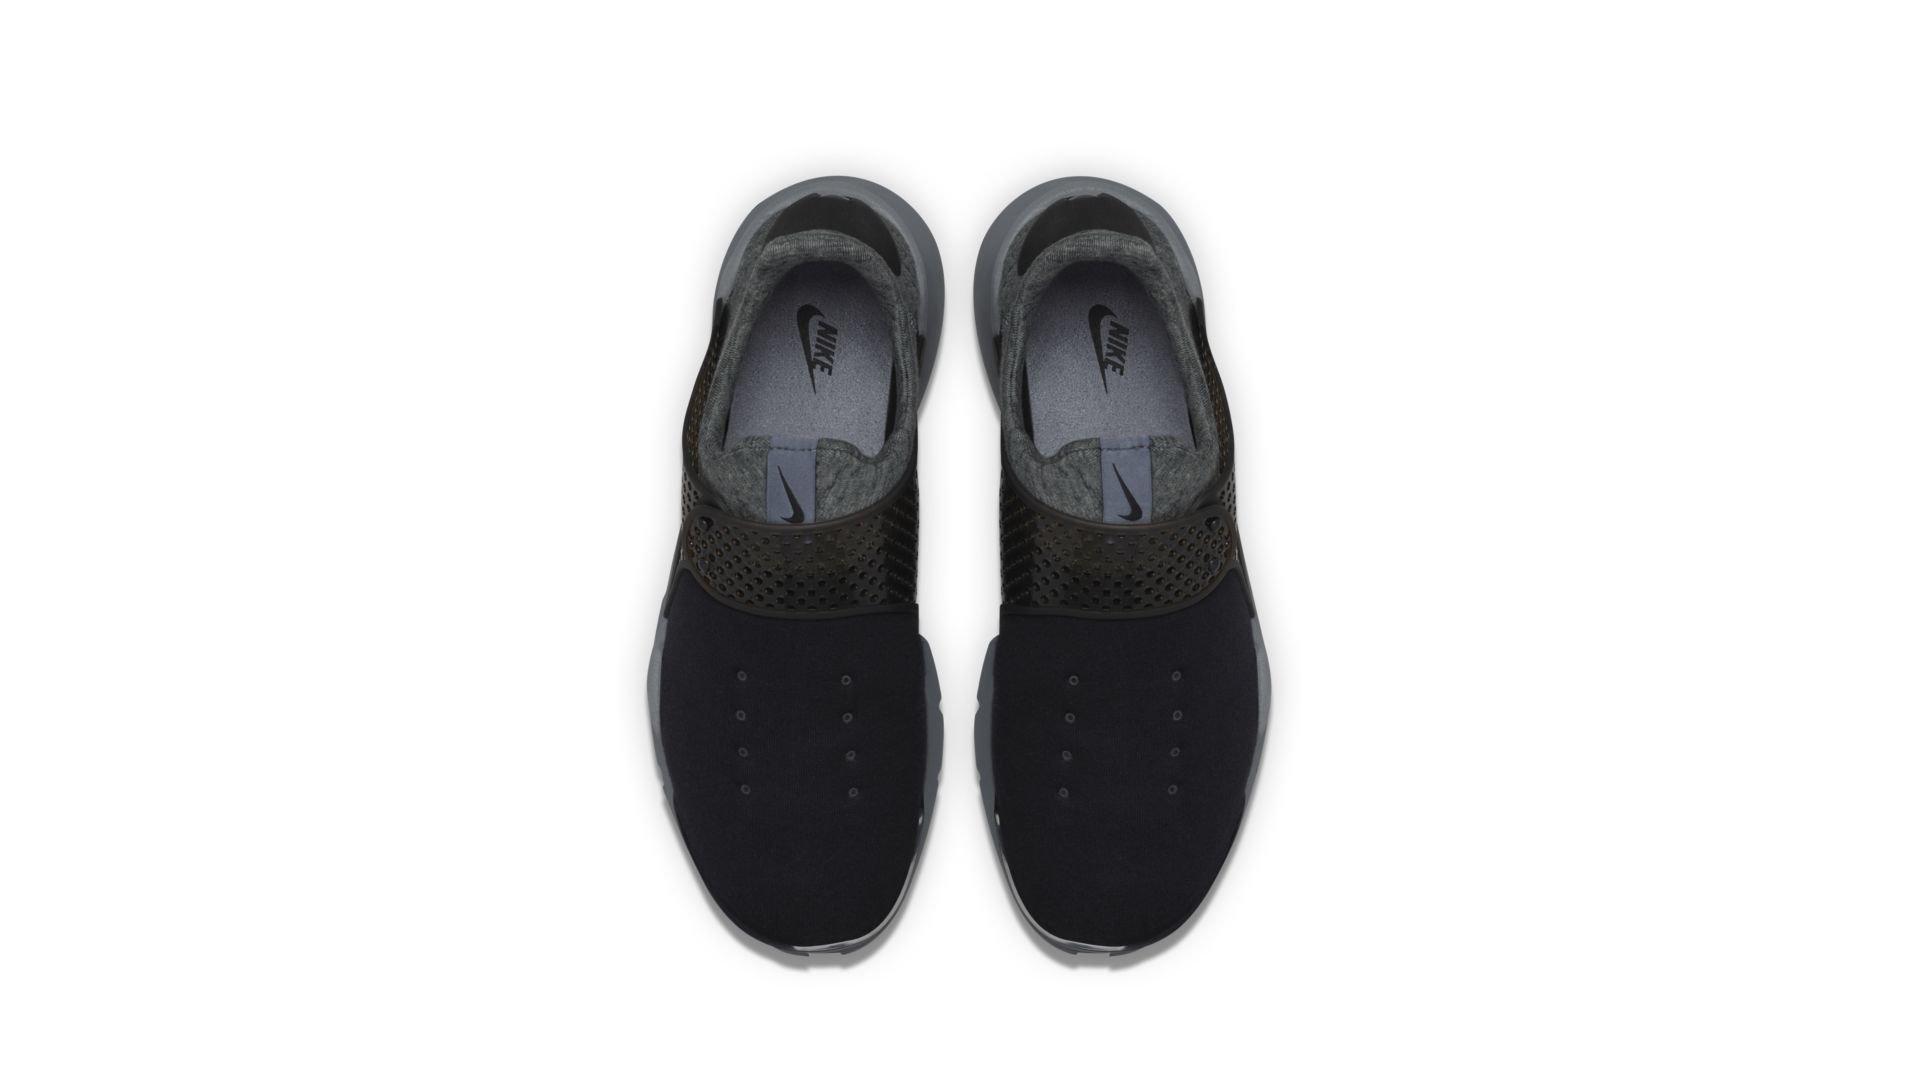 Nike Sock Dart Fleece Cool Grey (834669-001)